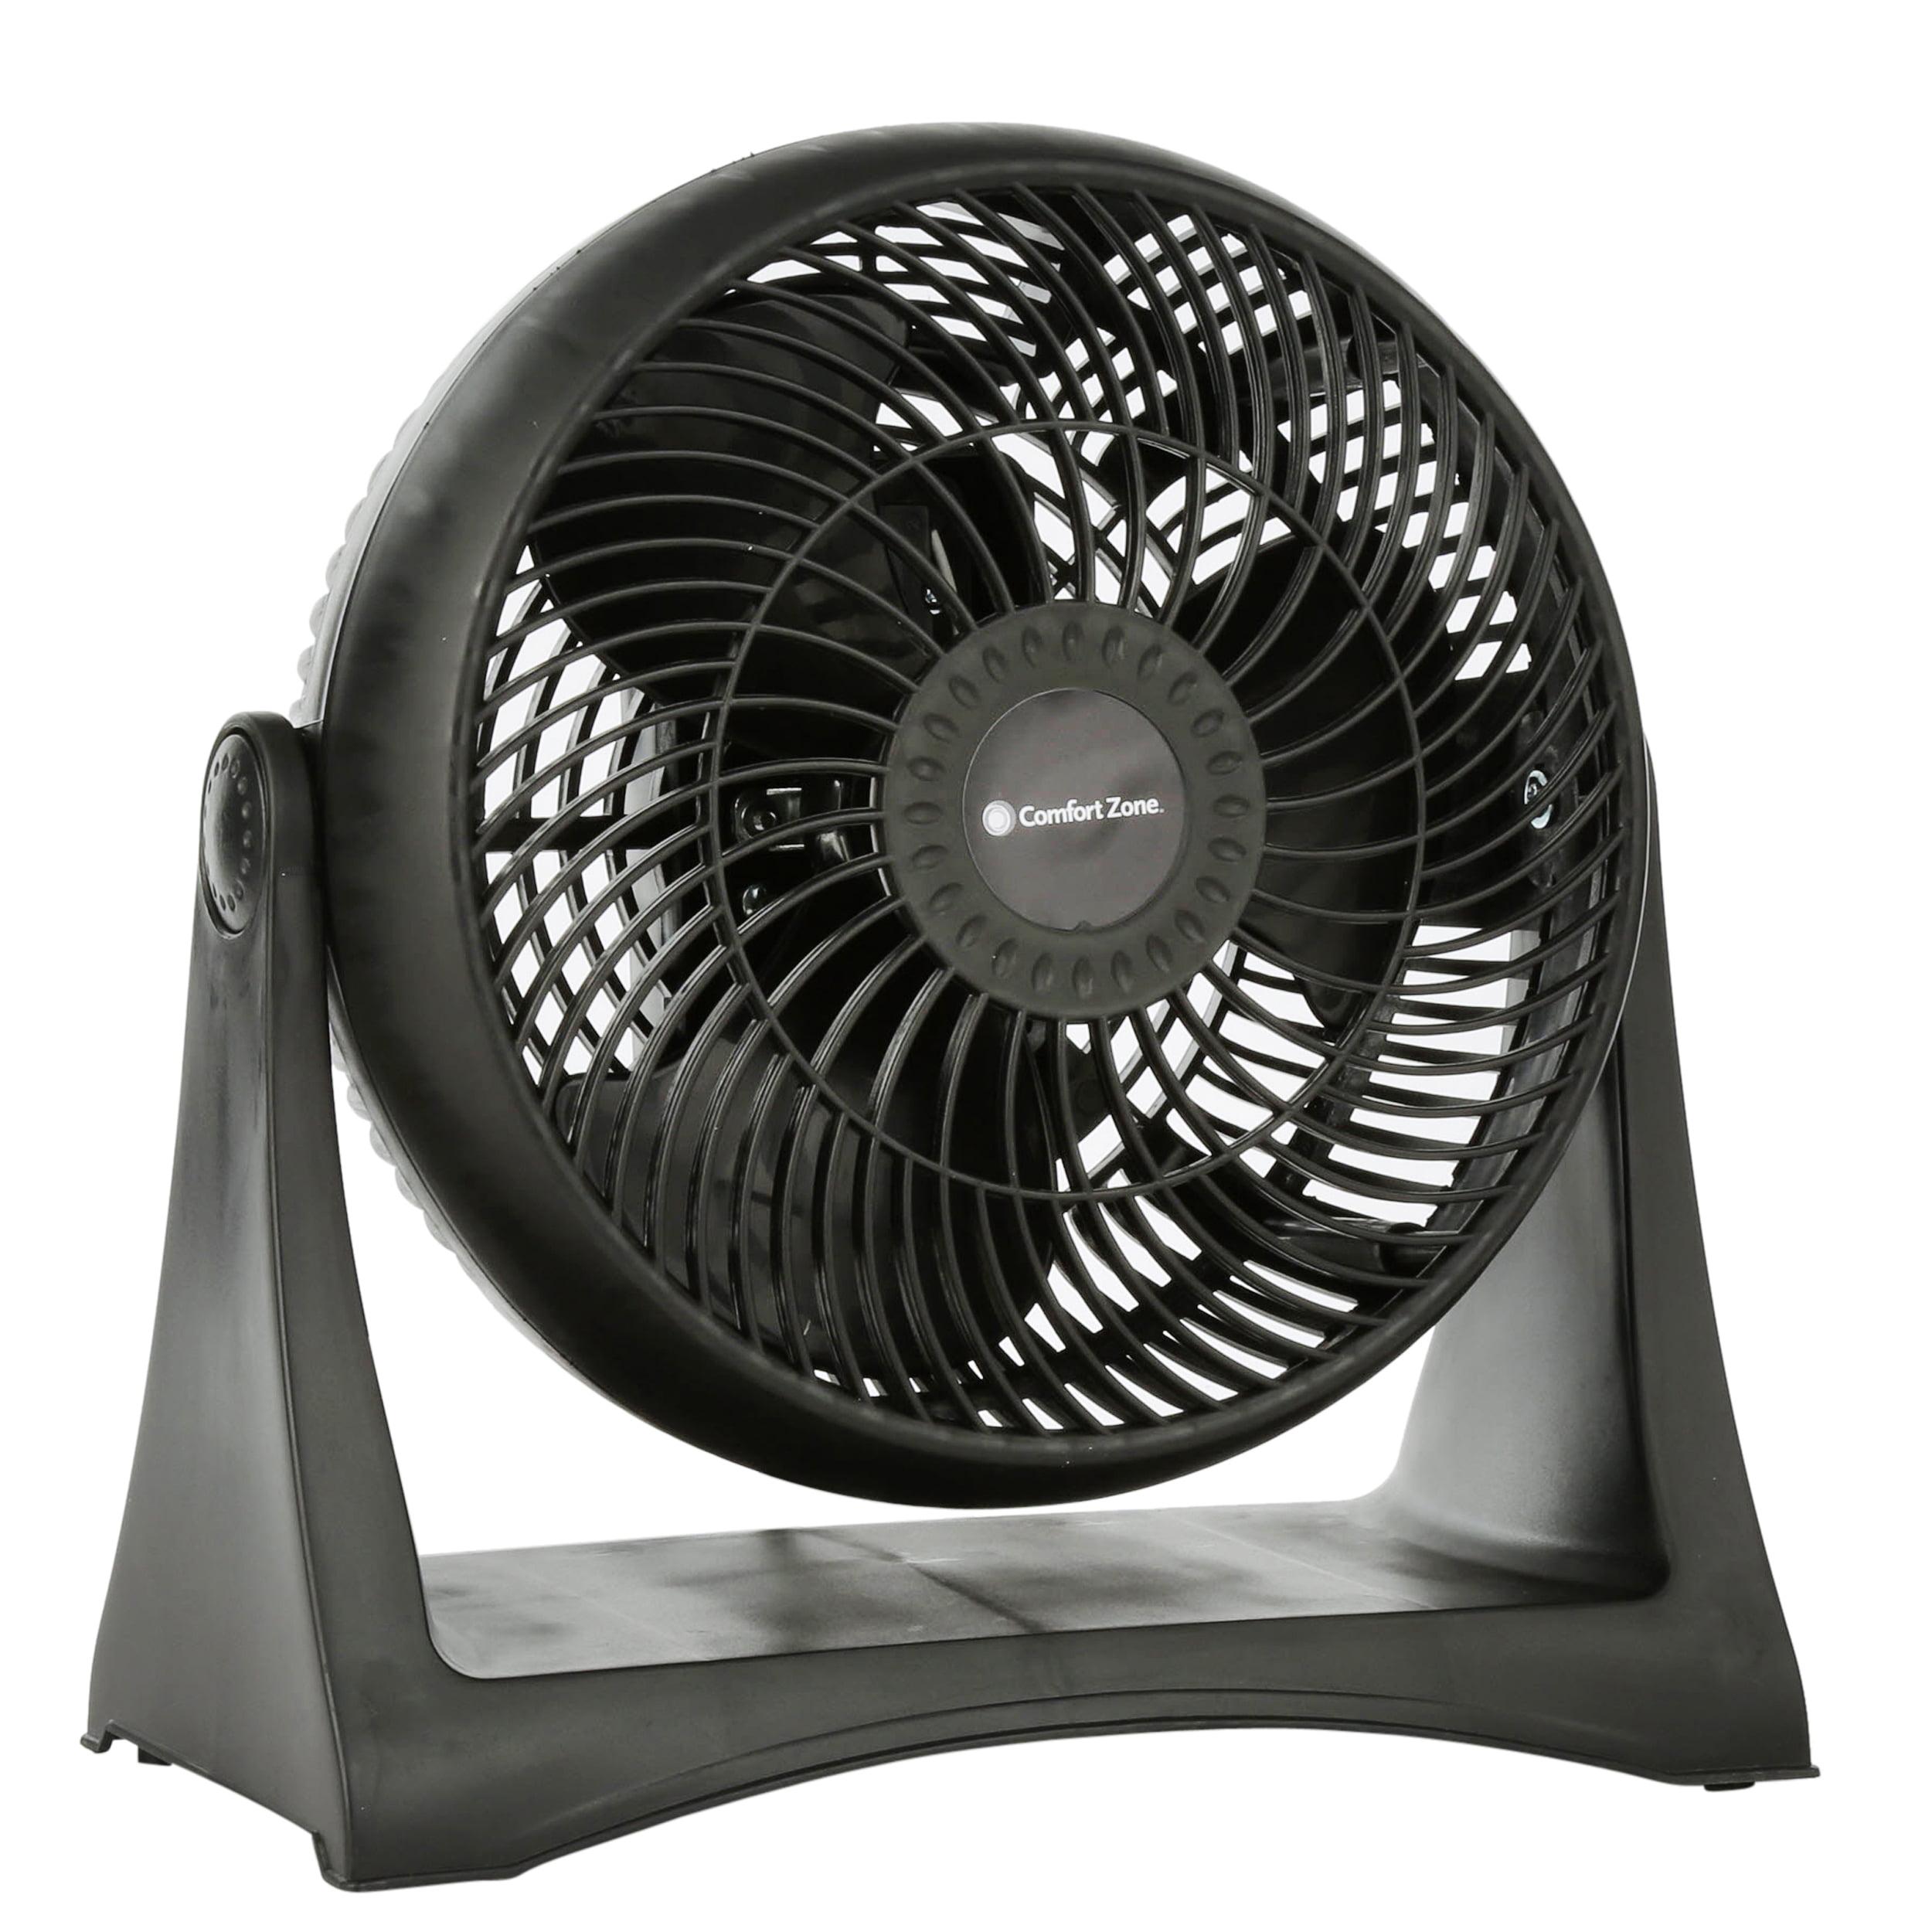 "Comfort Zone 8"" High Velocity Turbo 3-Speed Fan, Model #CZHVBT, Black"